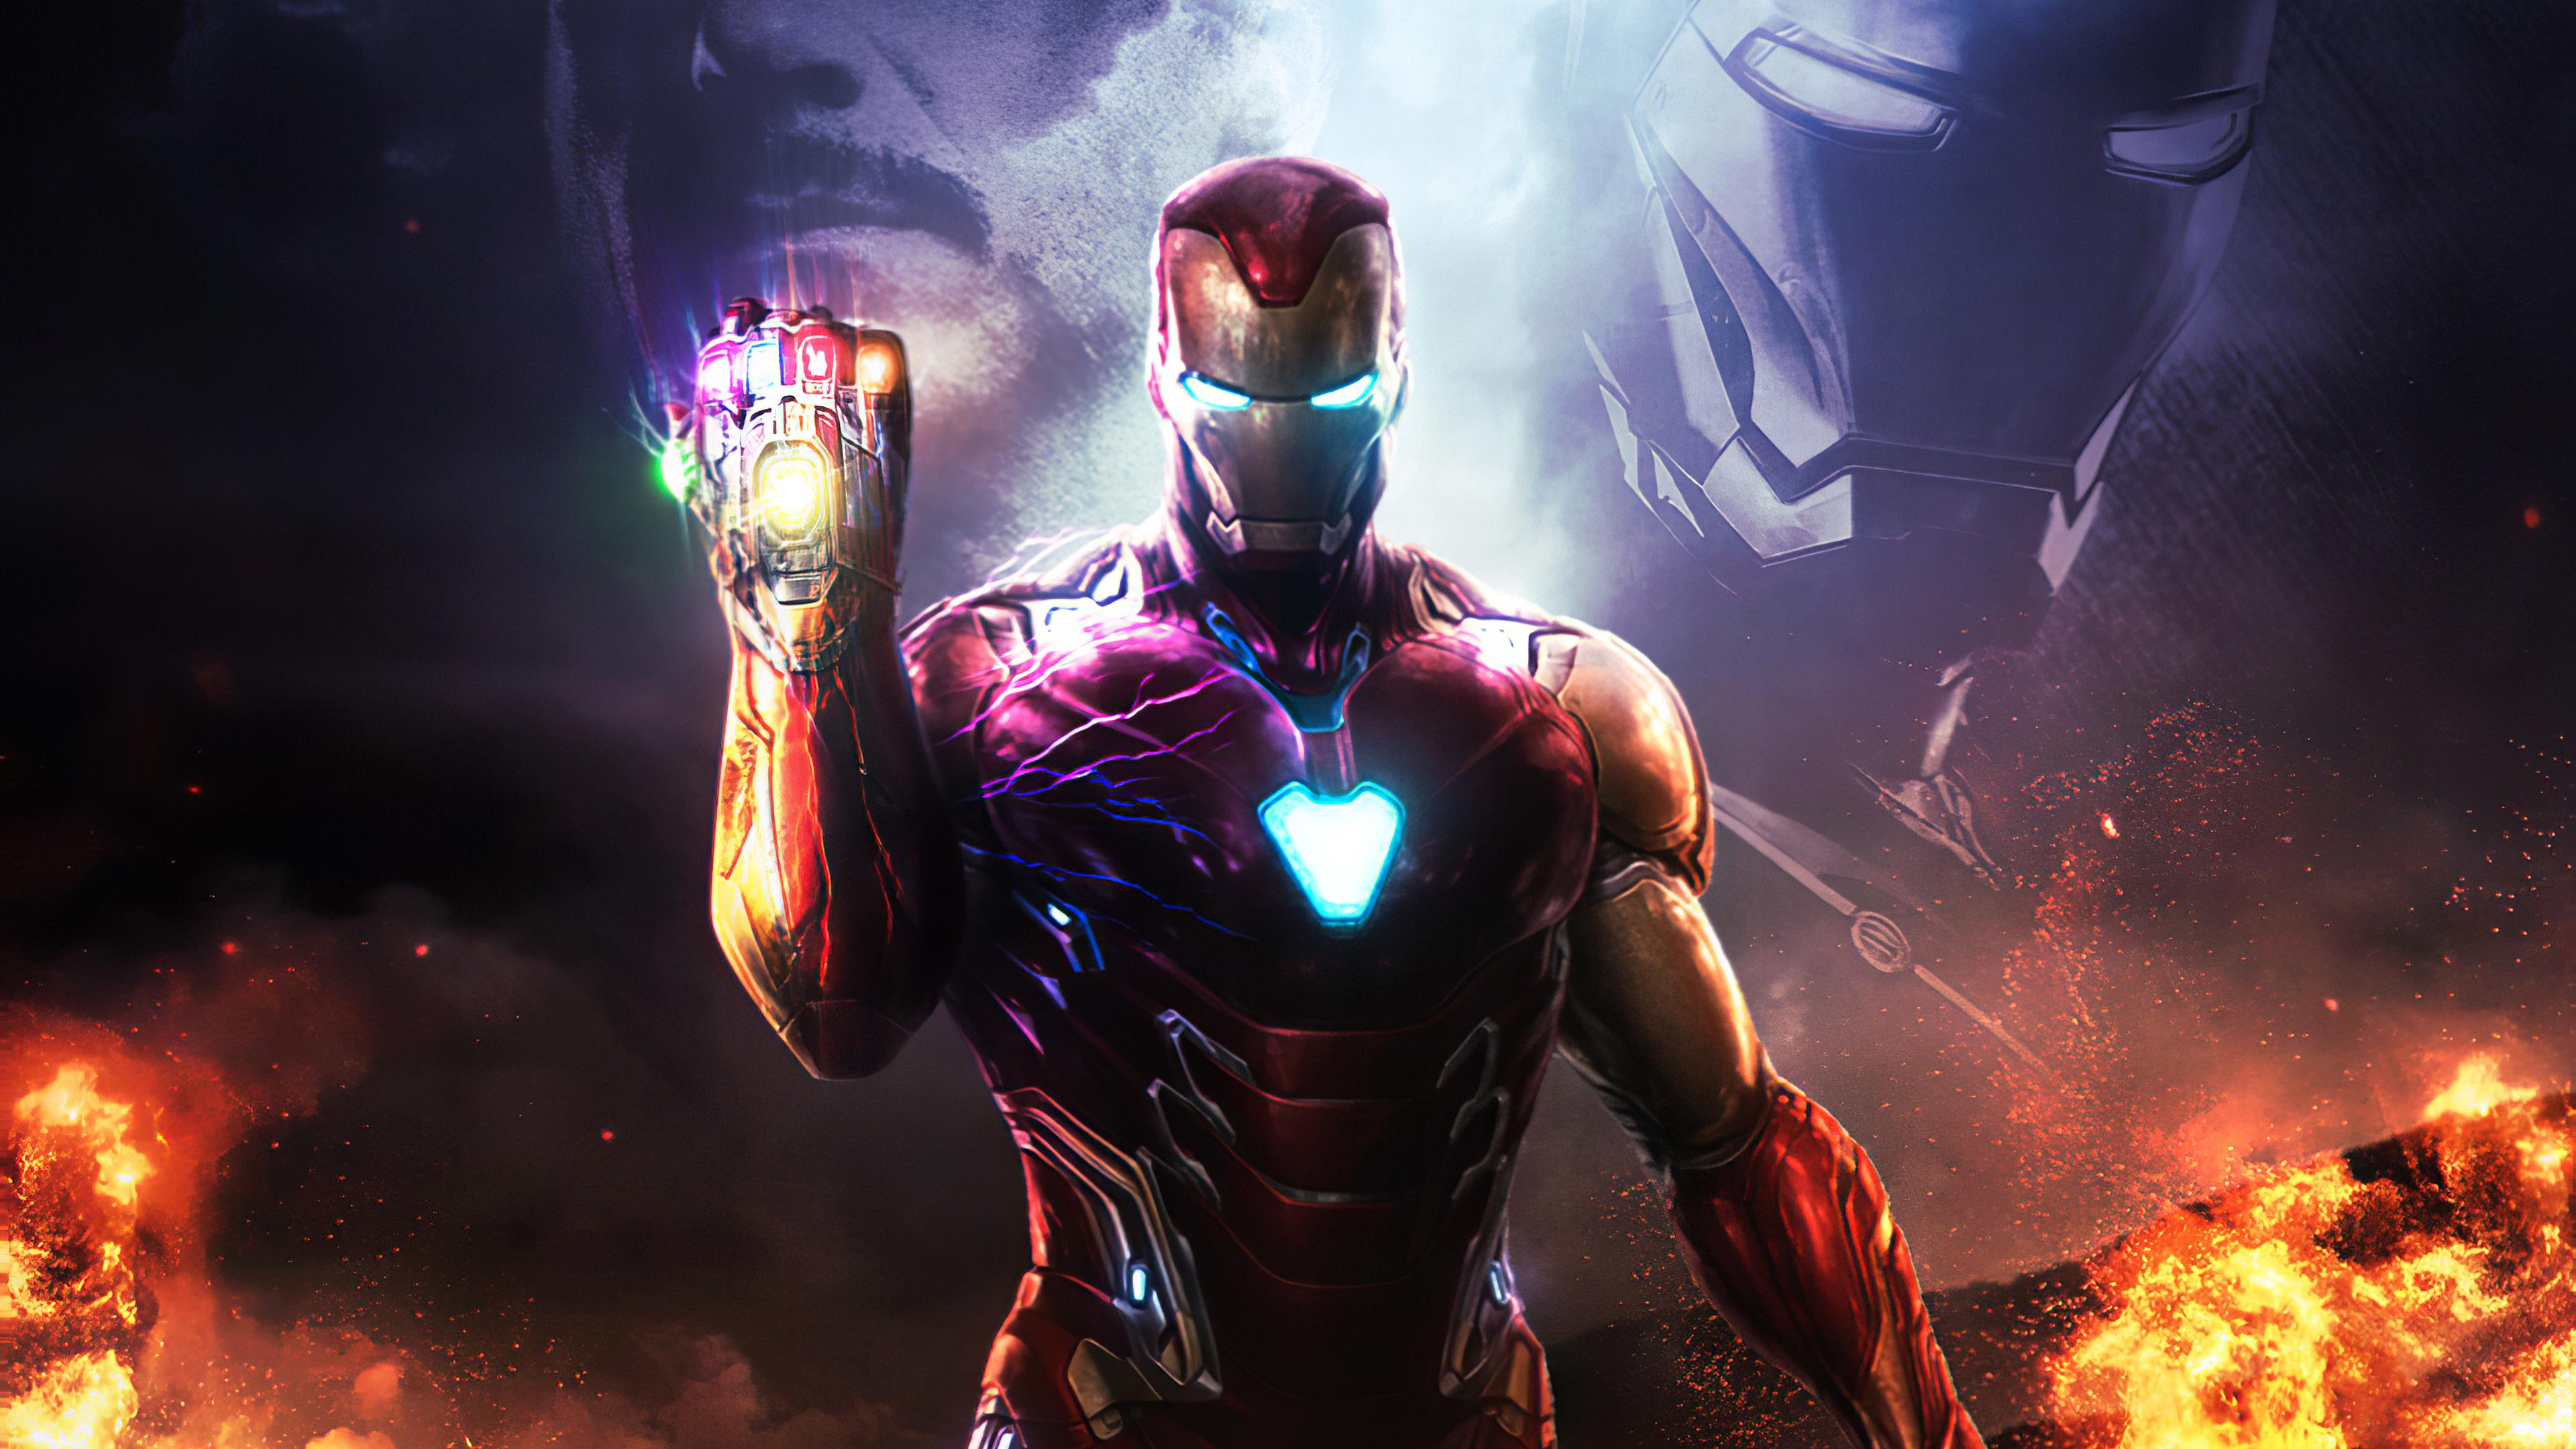 Iron Man Aka Robert Downey Jr, HD Superheroes, 4k ...